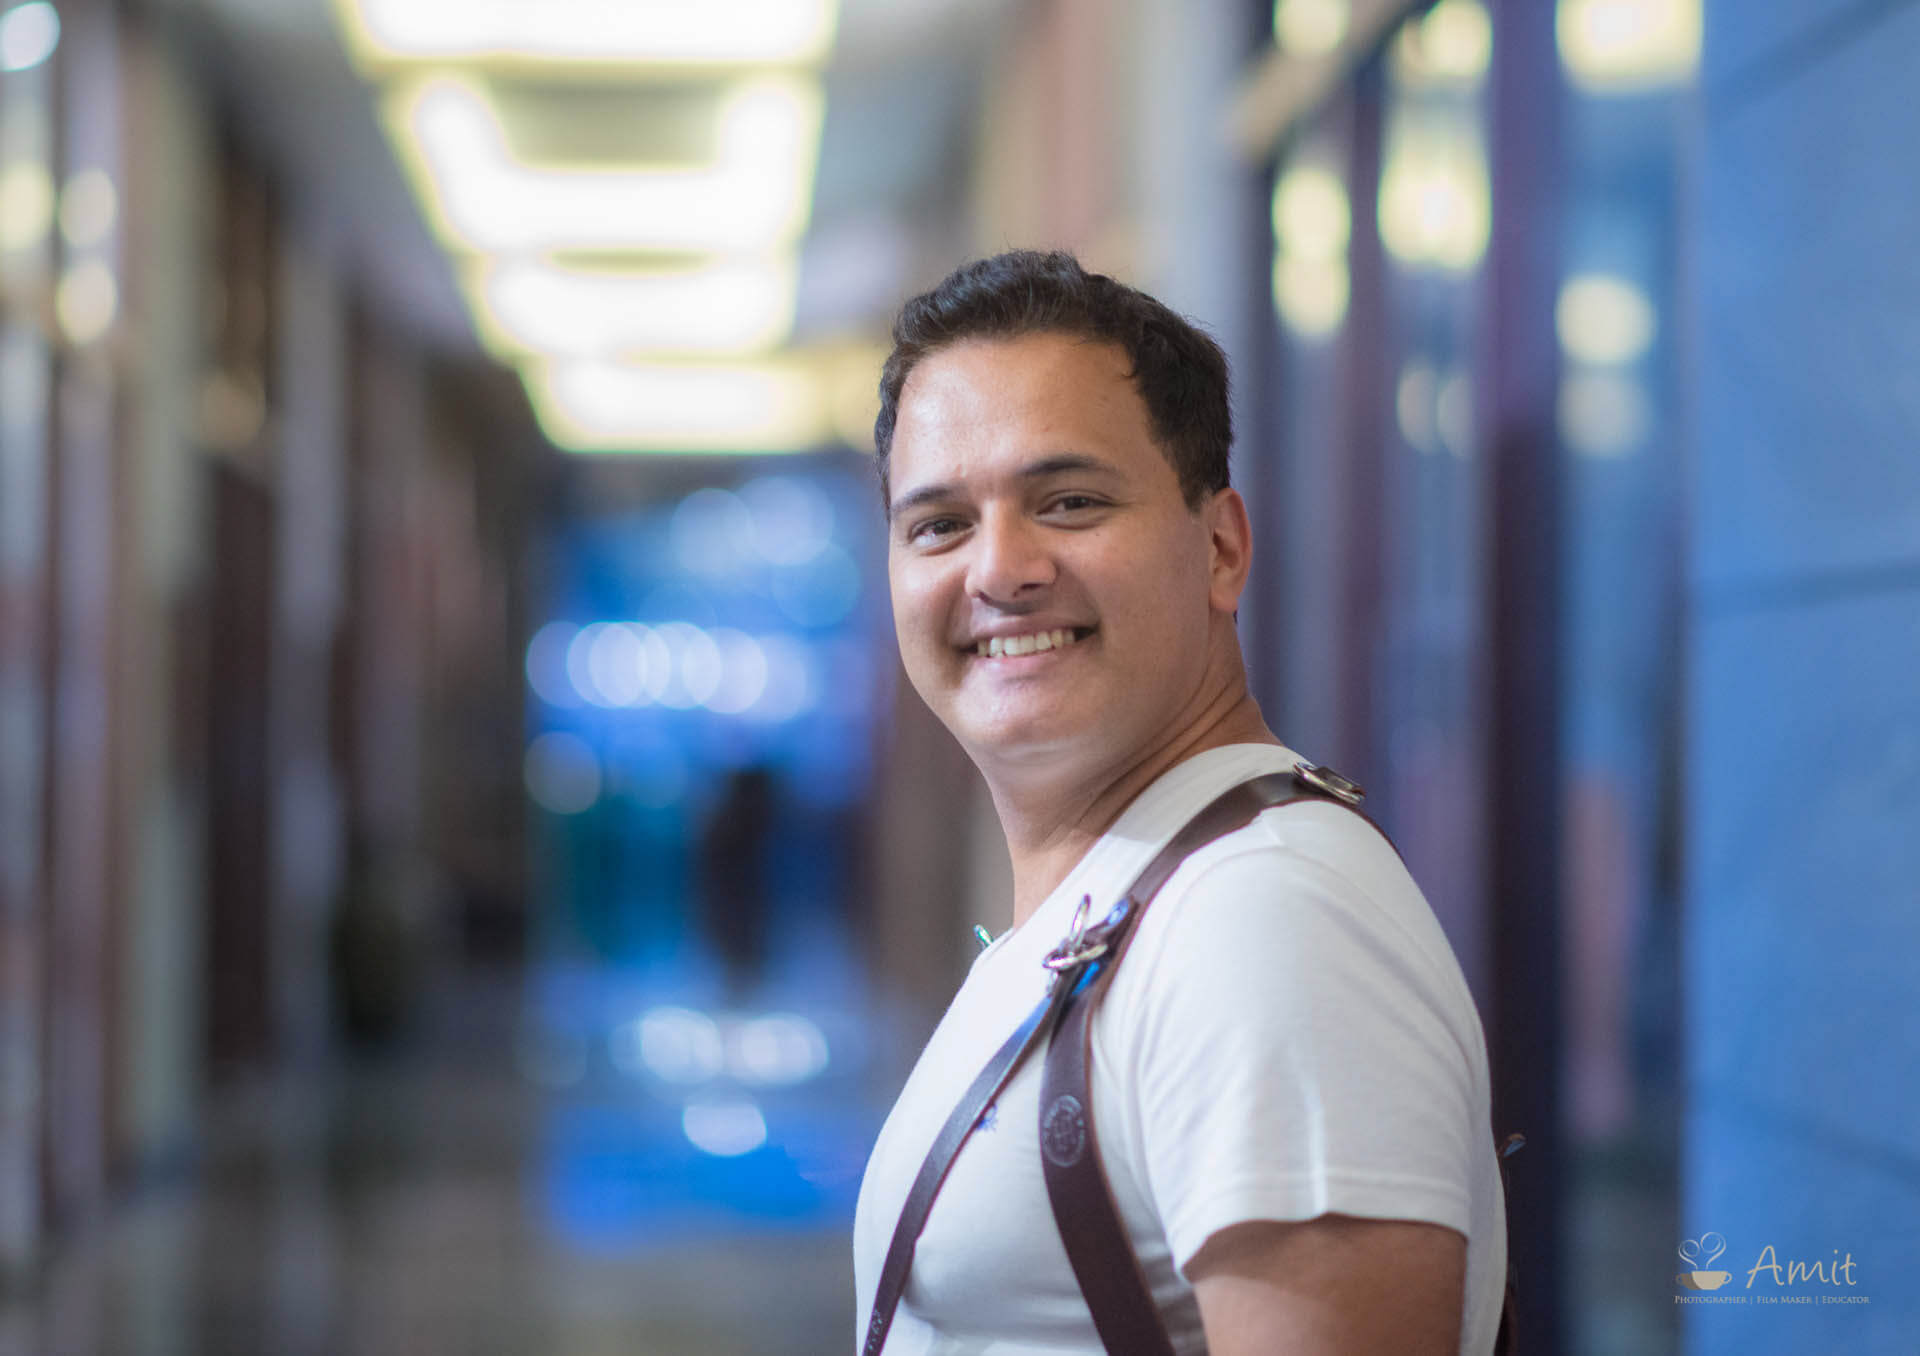 Amit Shindore - Nikon Mentors